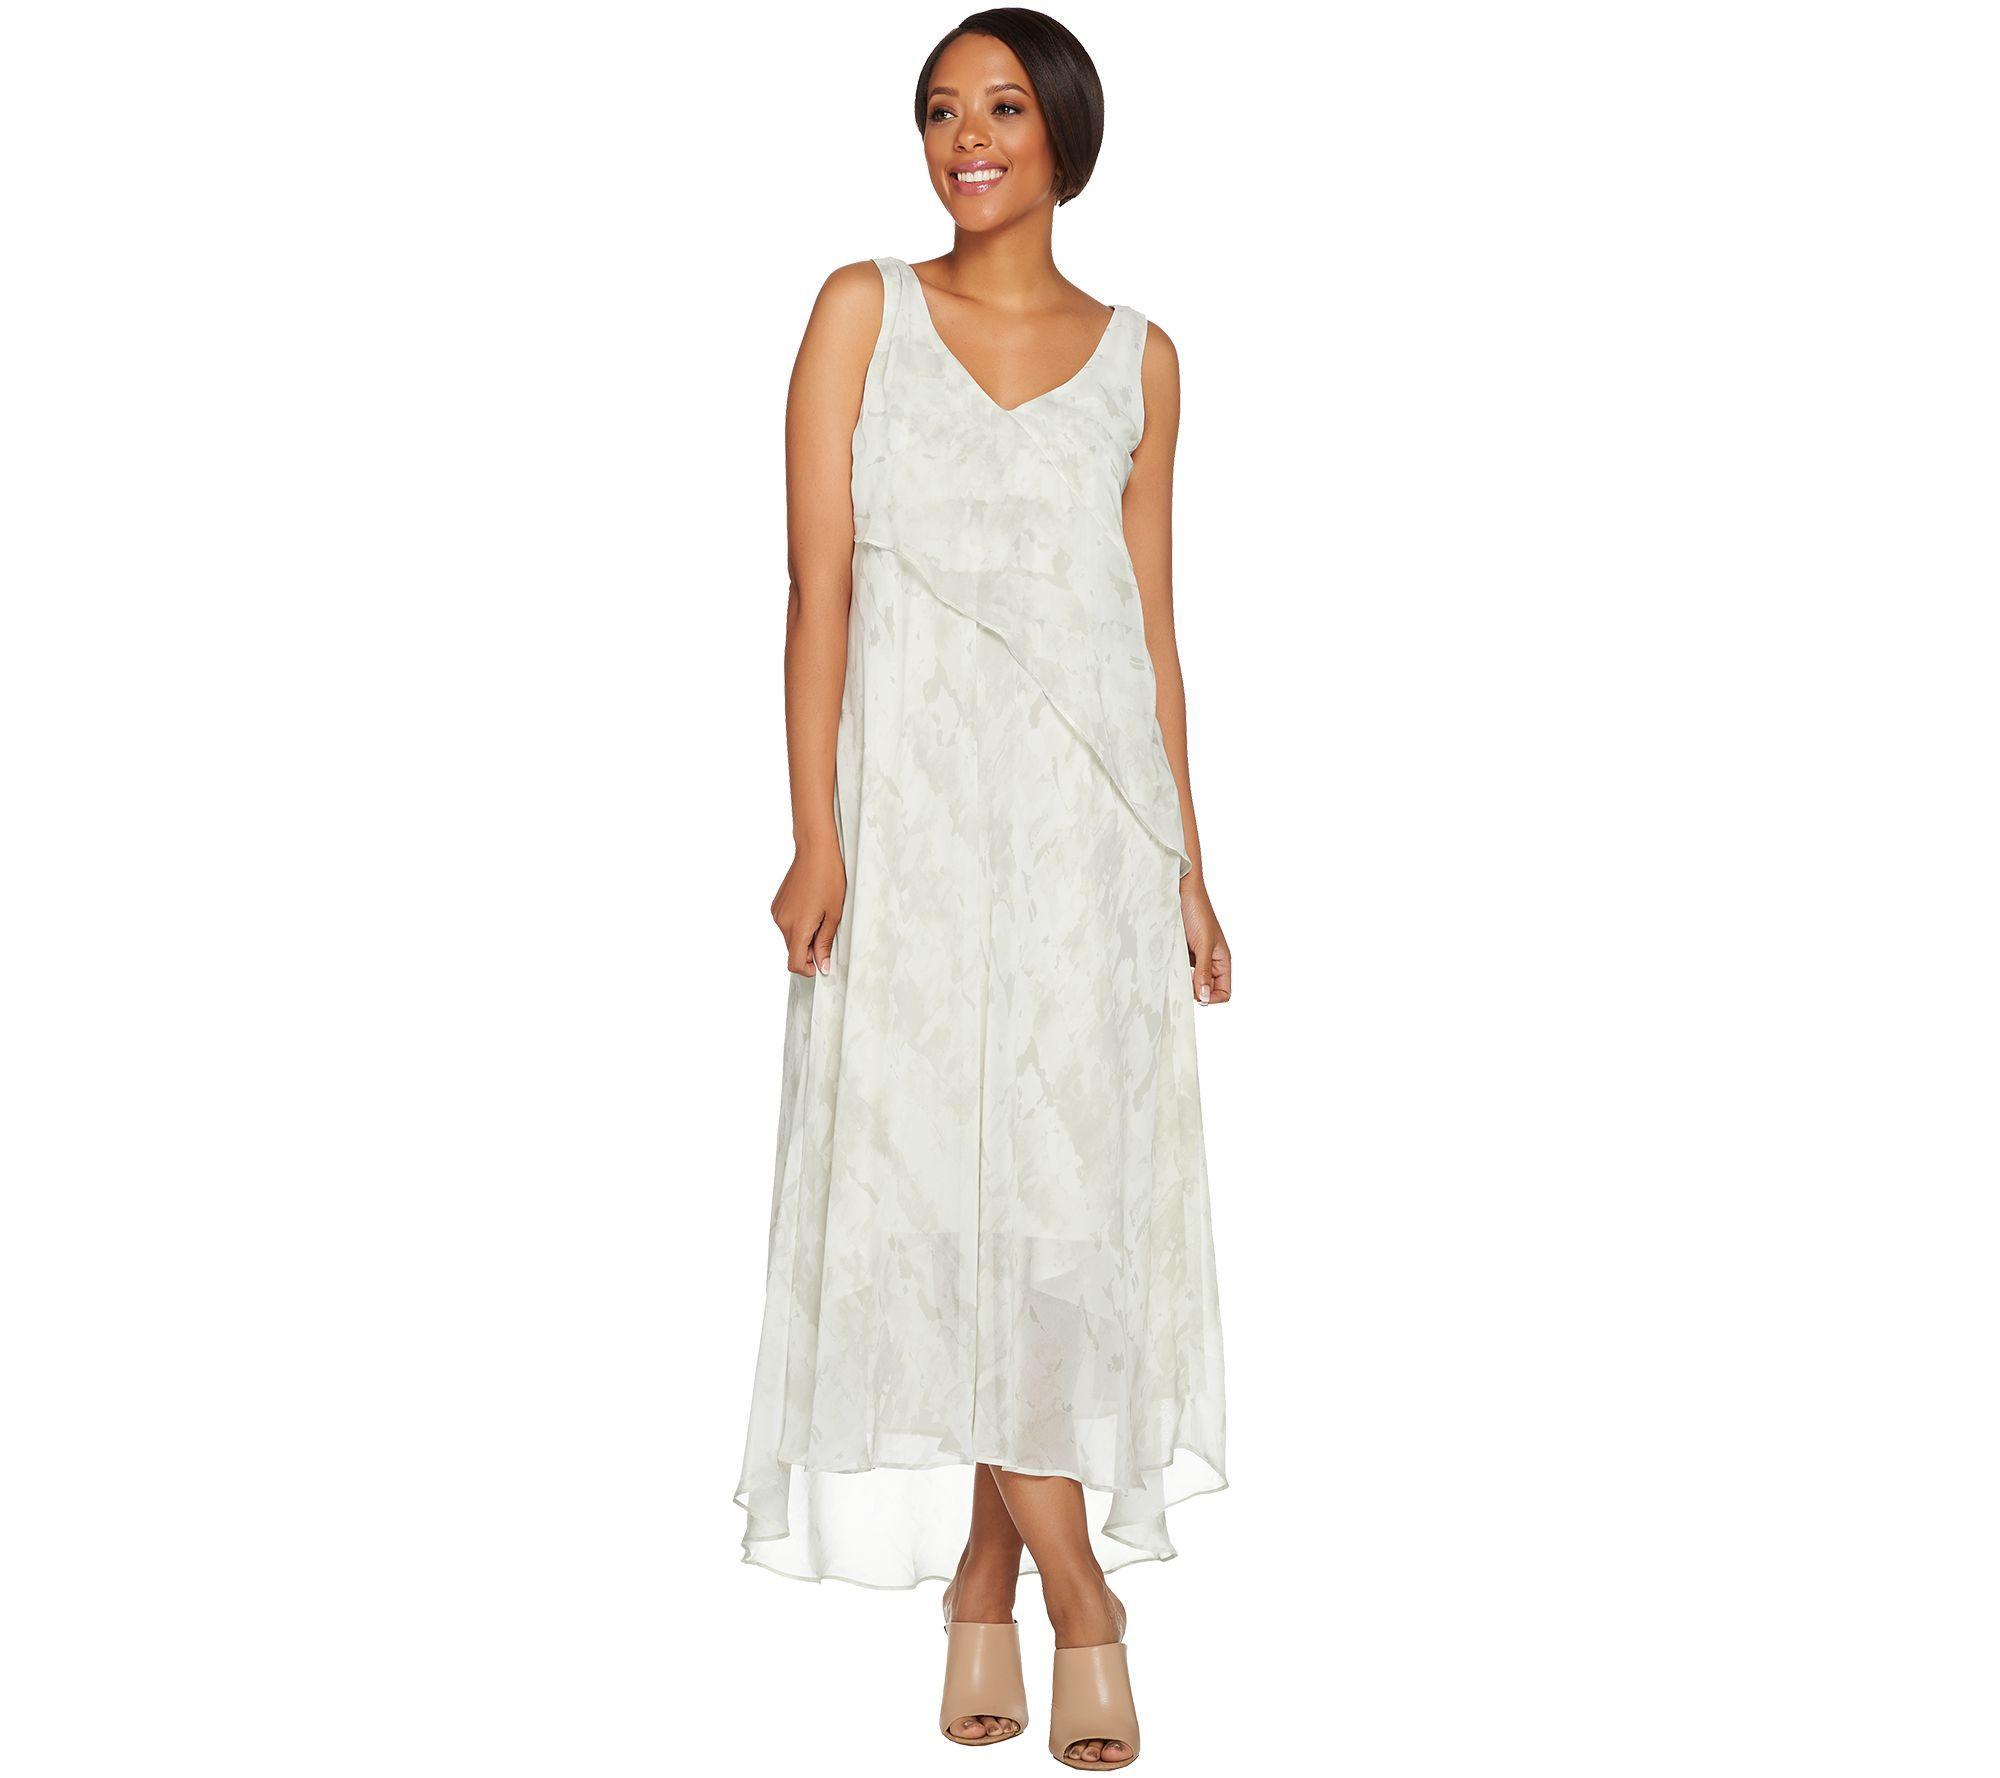 Pin By Candy Darling On Jean S Dress Dresses Sleeveless Maxi Dress Maxi Dress [ 1778 x 2000 Pixel ]